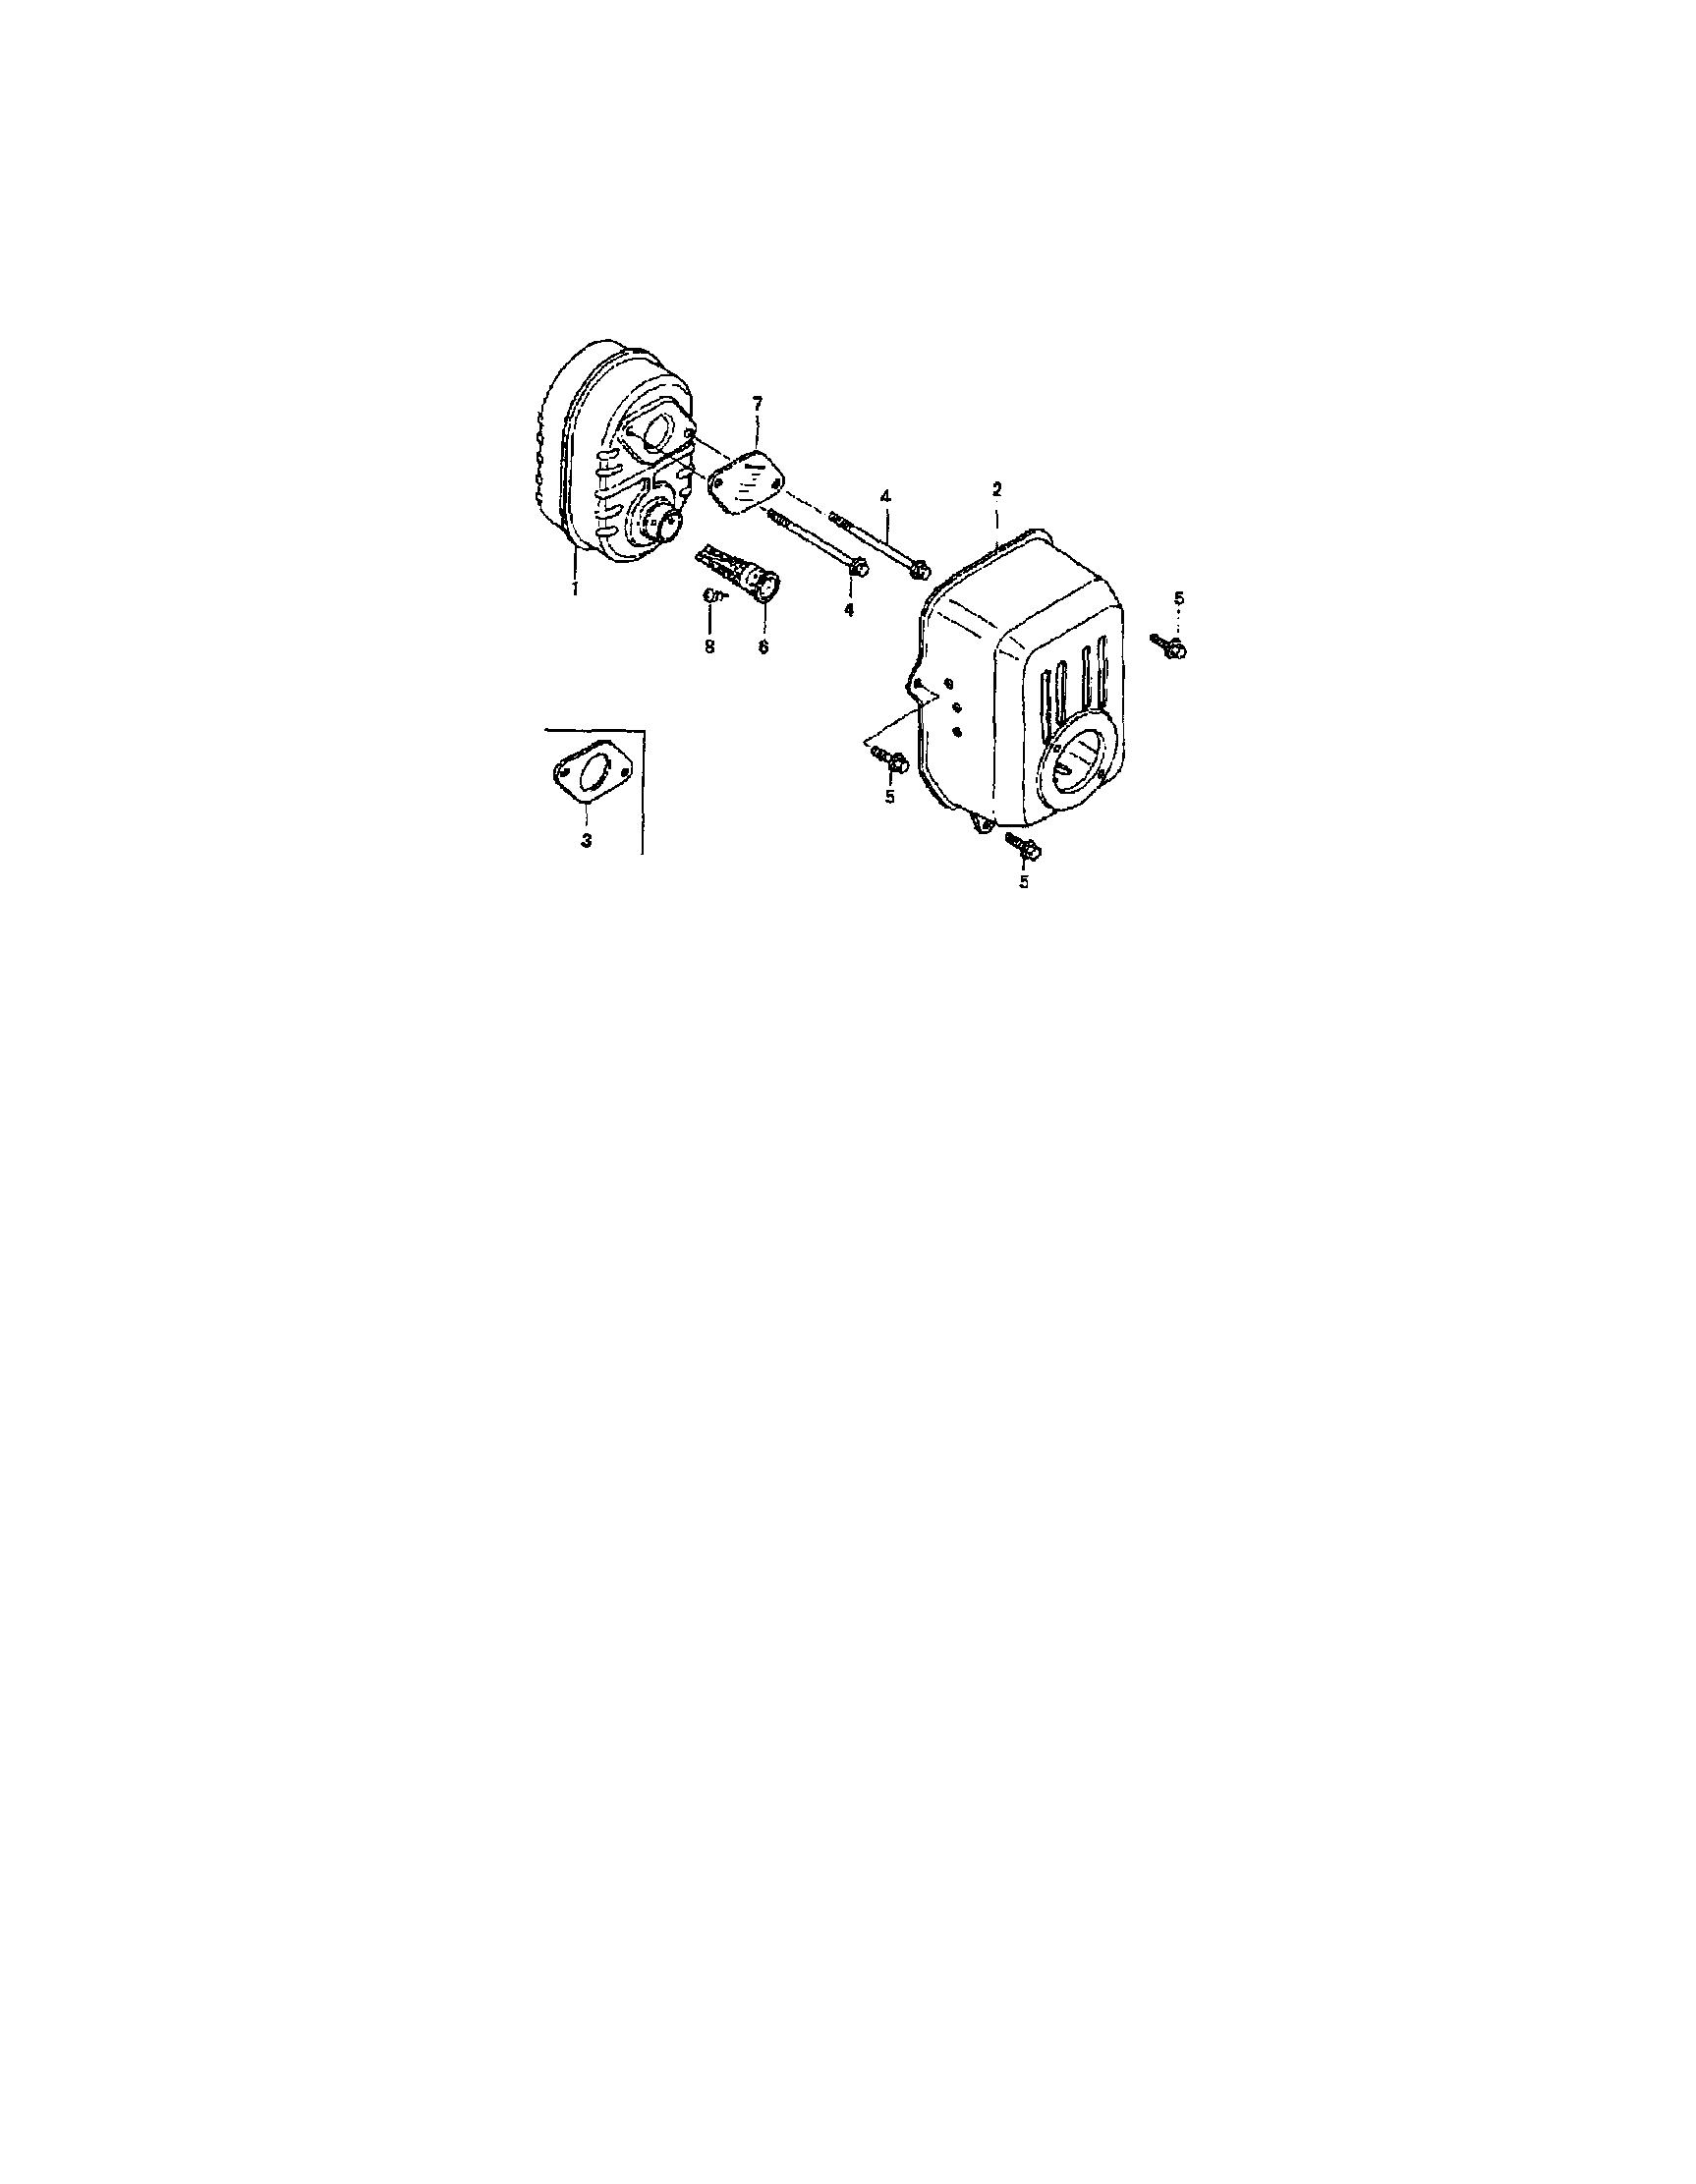 Honda model GCV160-LAS3A engine genuine parts